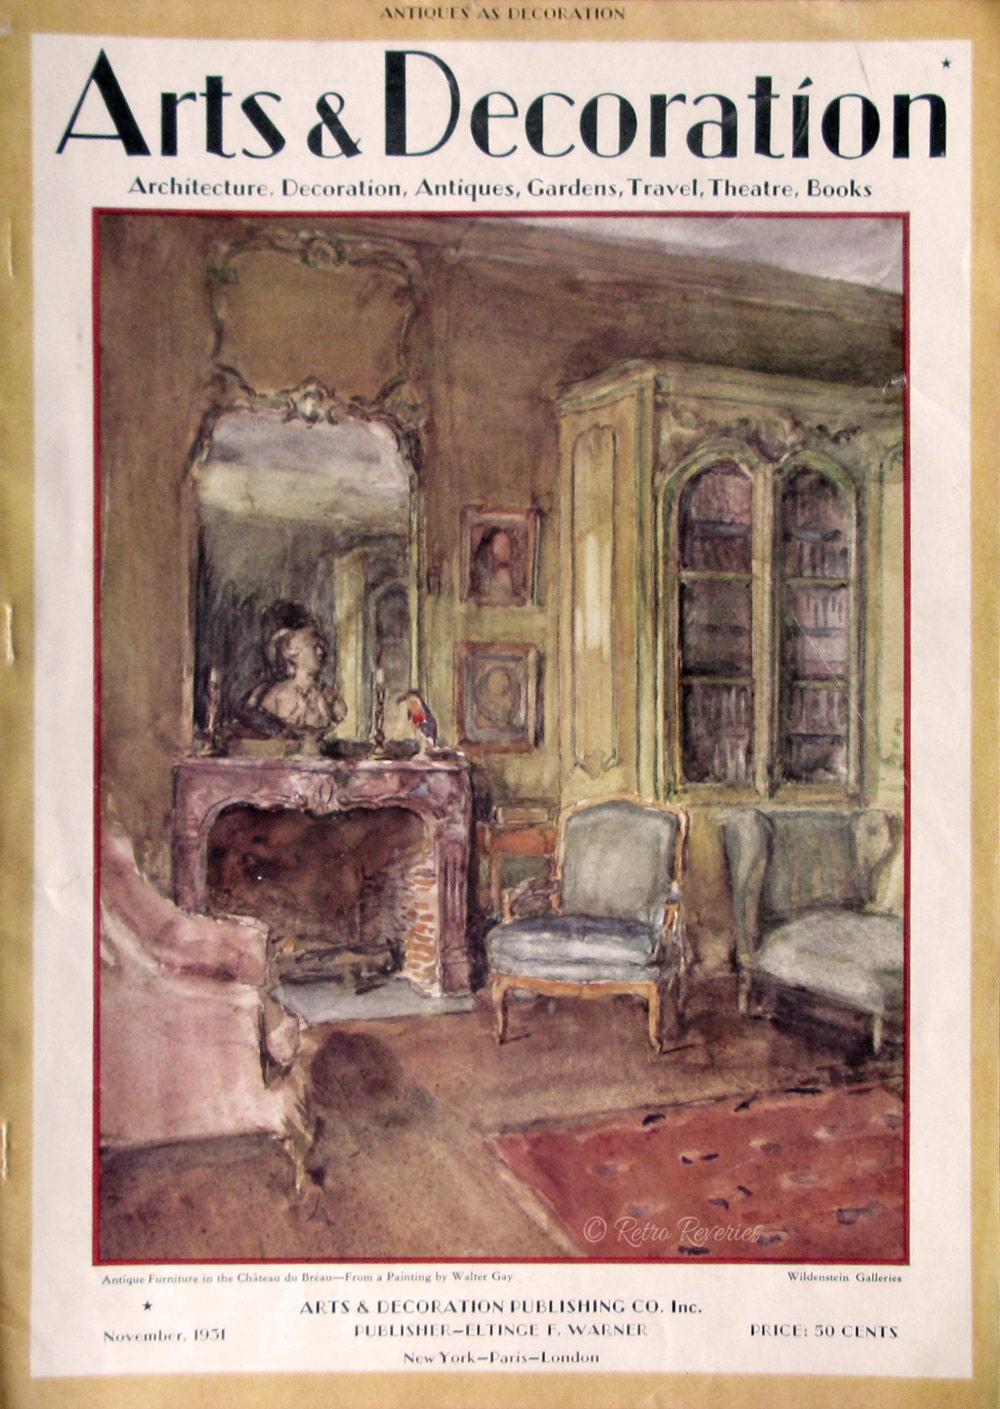 Magazine Art Et Décoration 1931 arts & decoration magazine cover - walter gay art - chateau du breau  drawing room - wildenstein galleries - 1930s vintage illustration